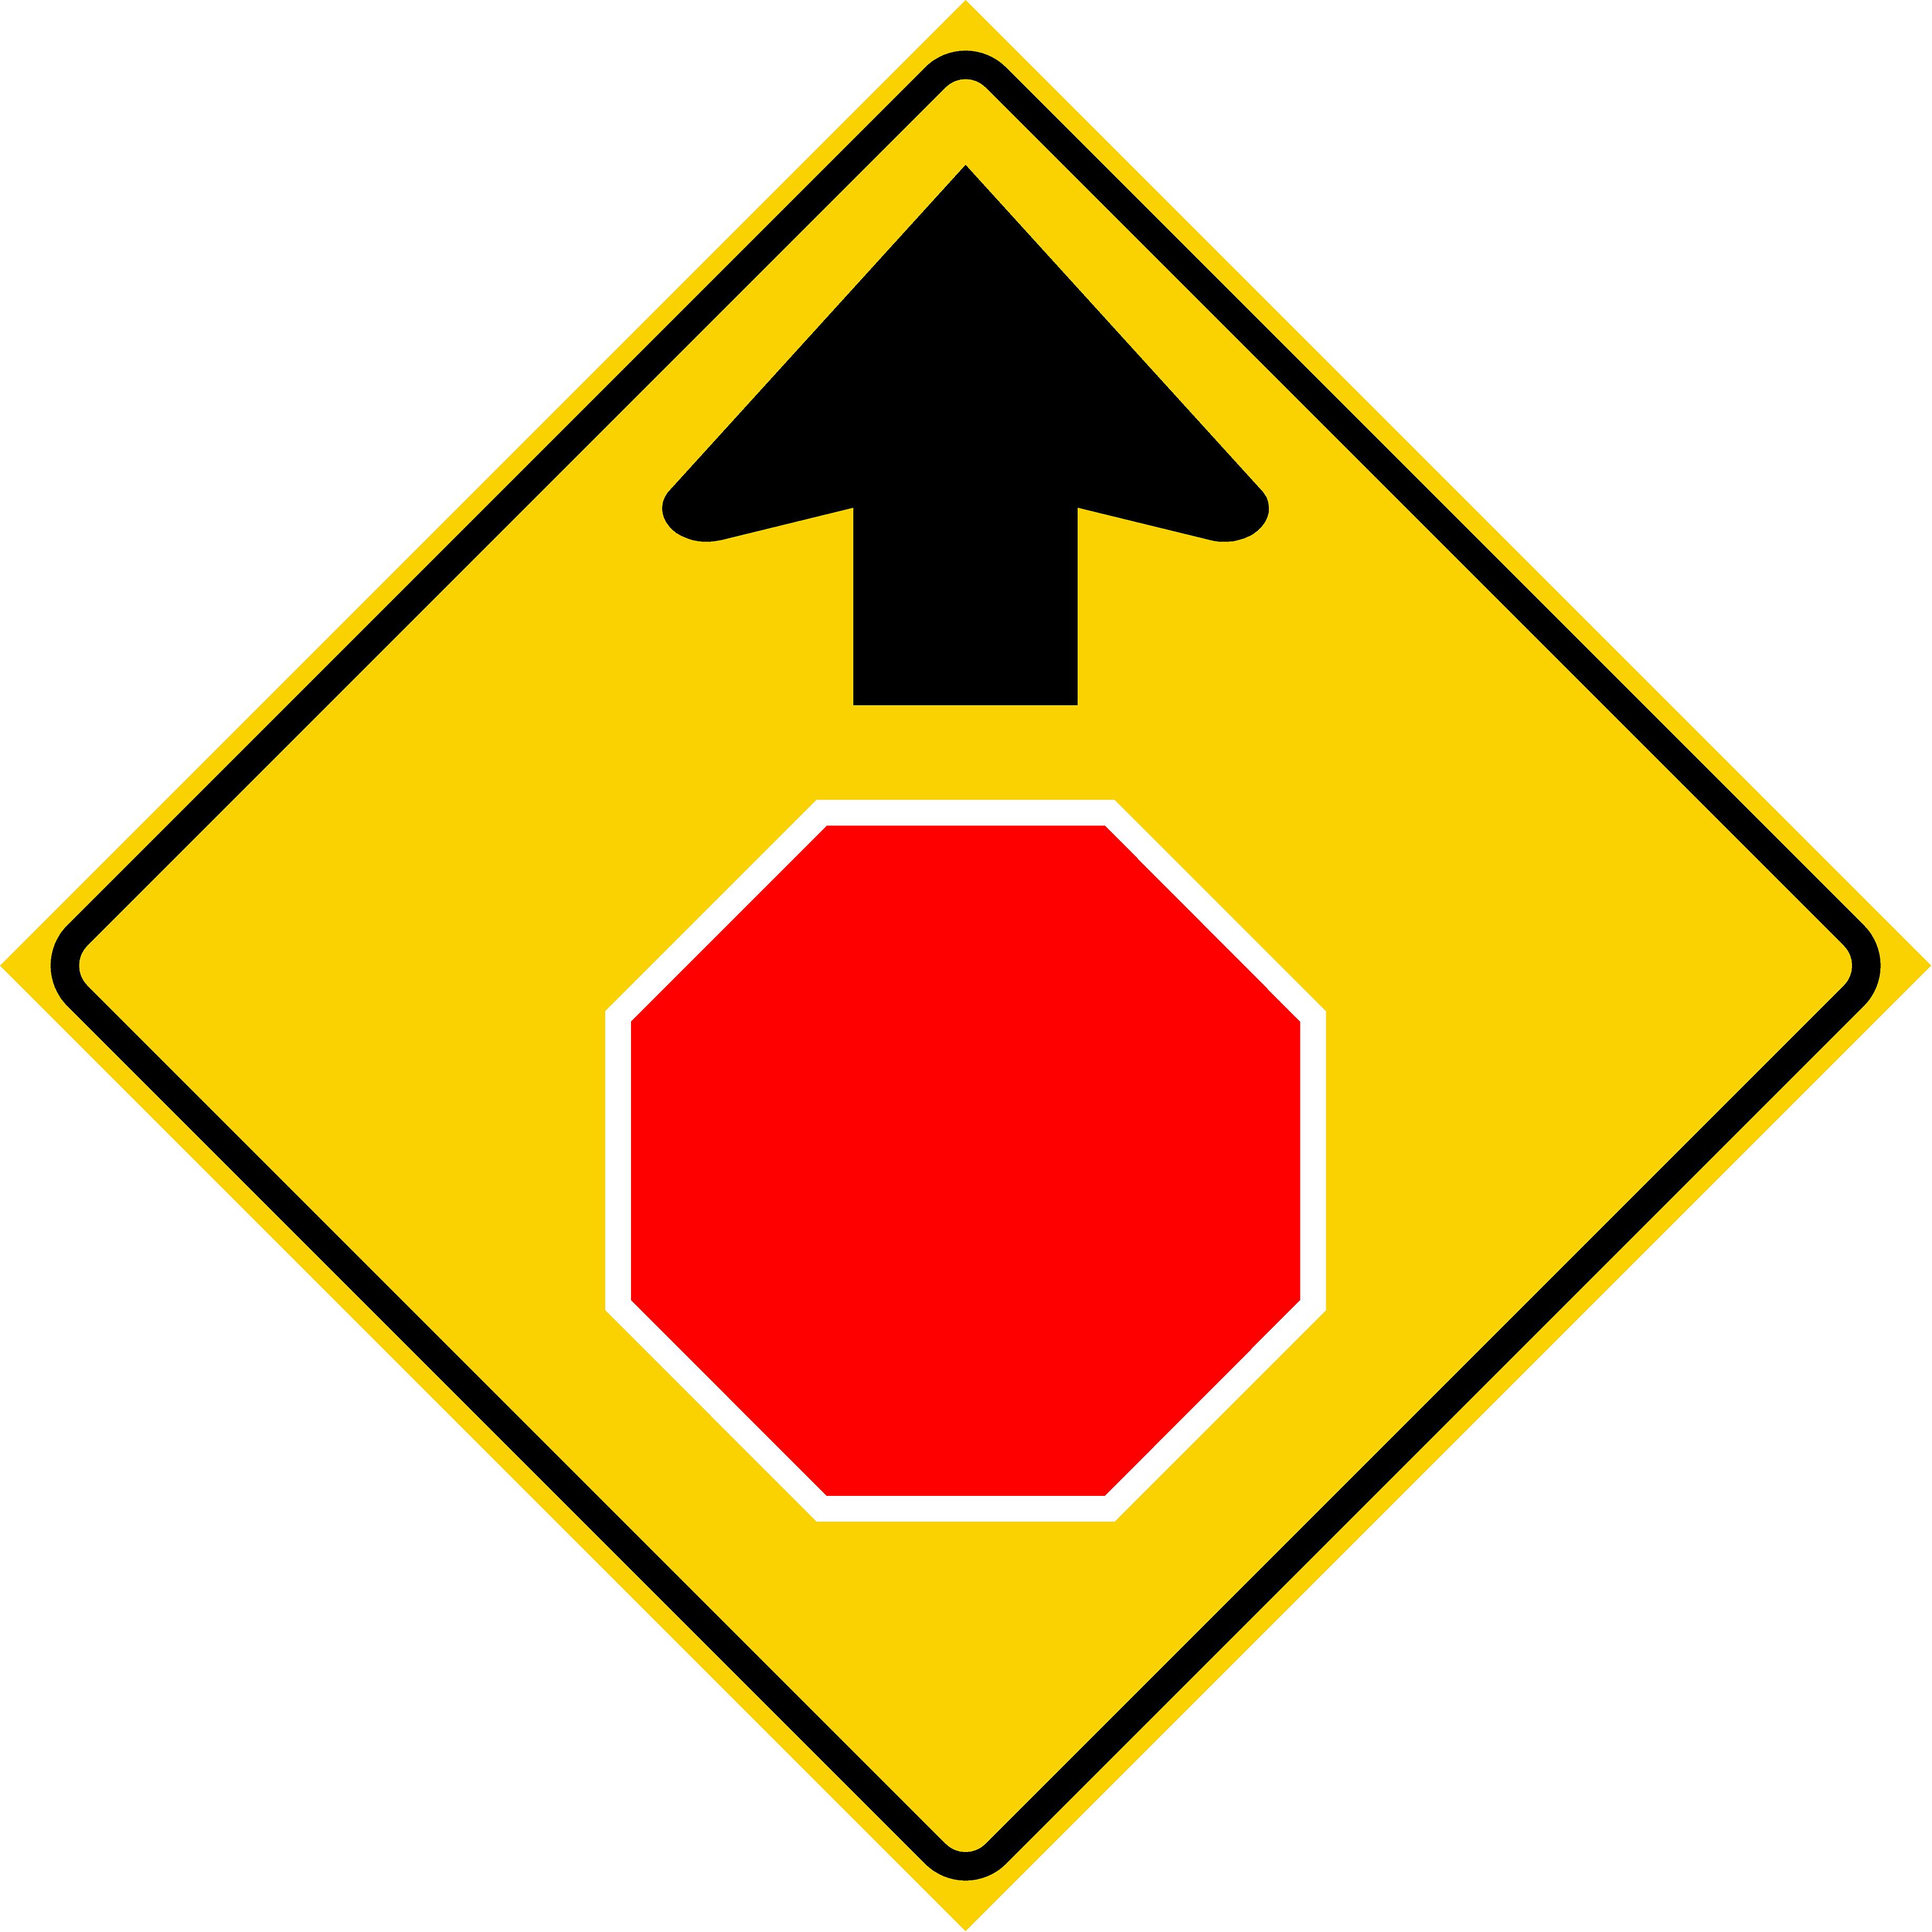 Stop Ahead (W3-1)